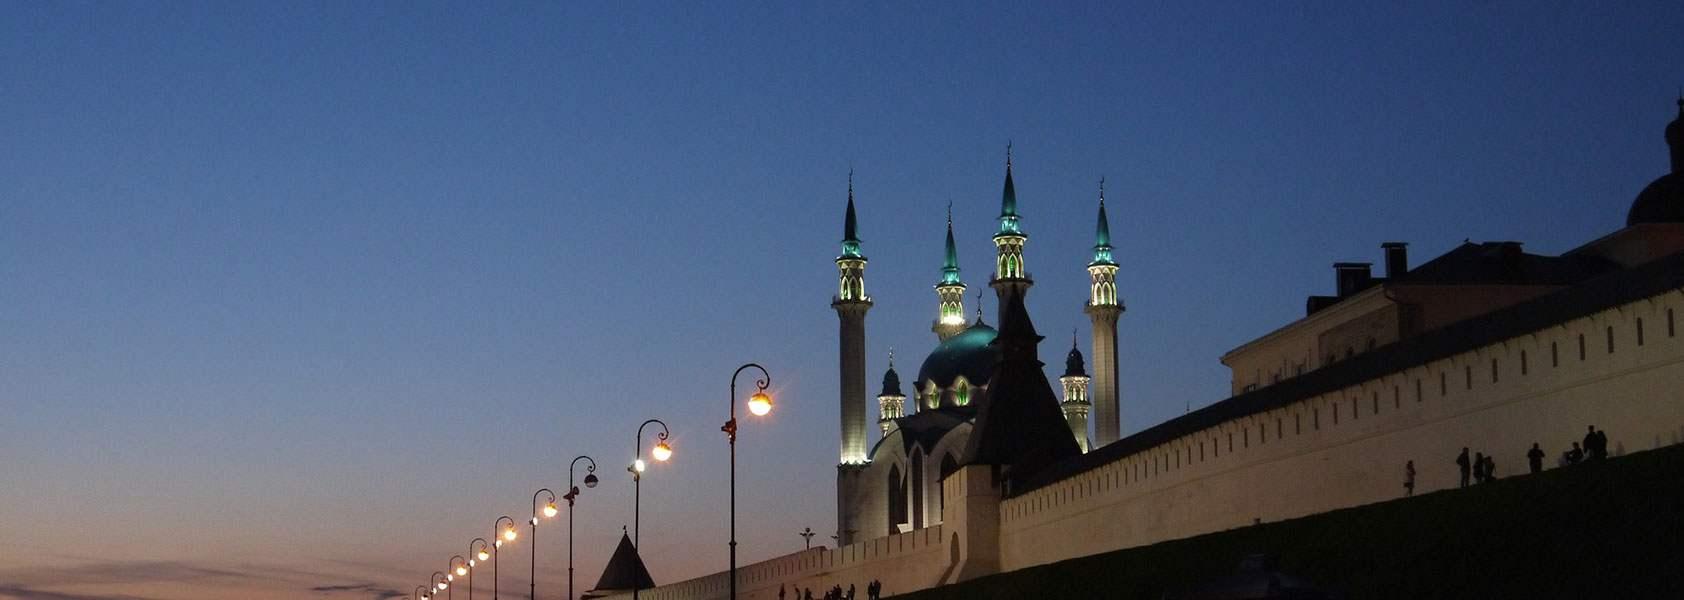 Rusland | Culturele rondreis geschiedenis Tatarstan